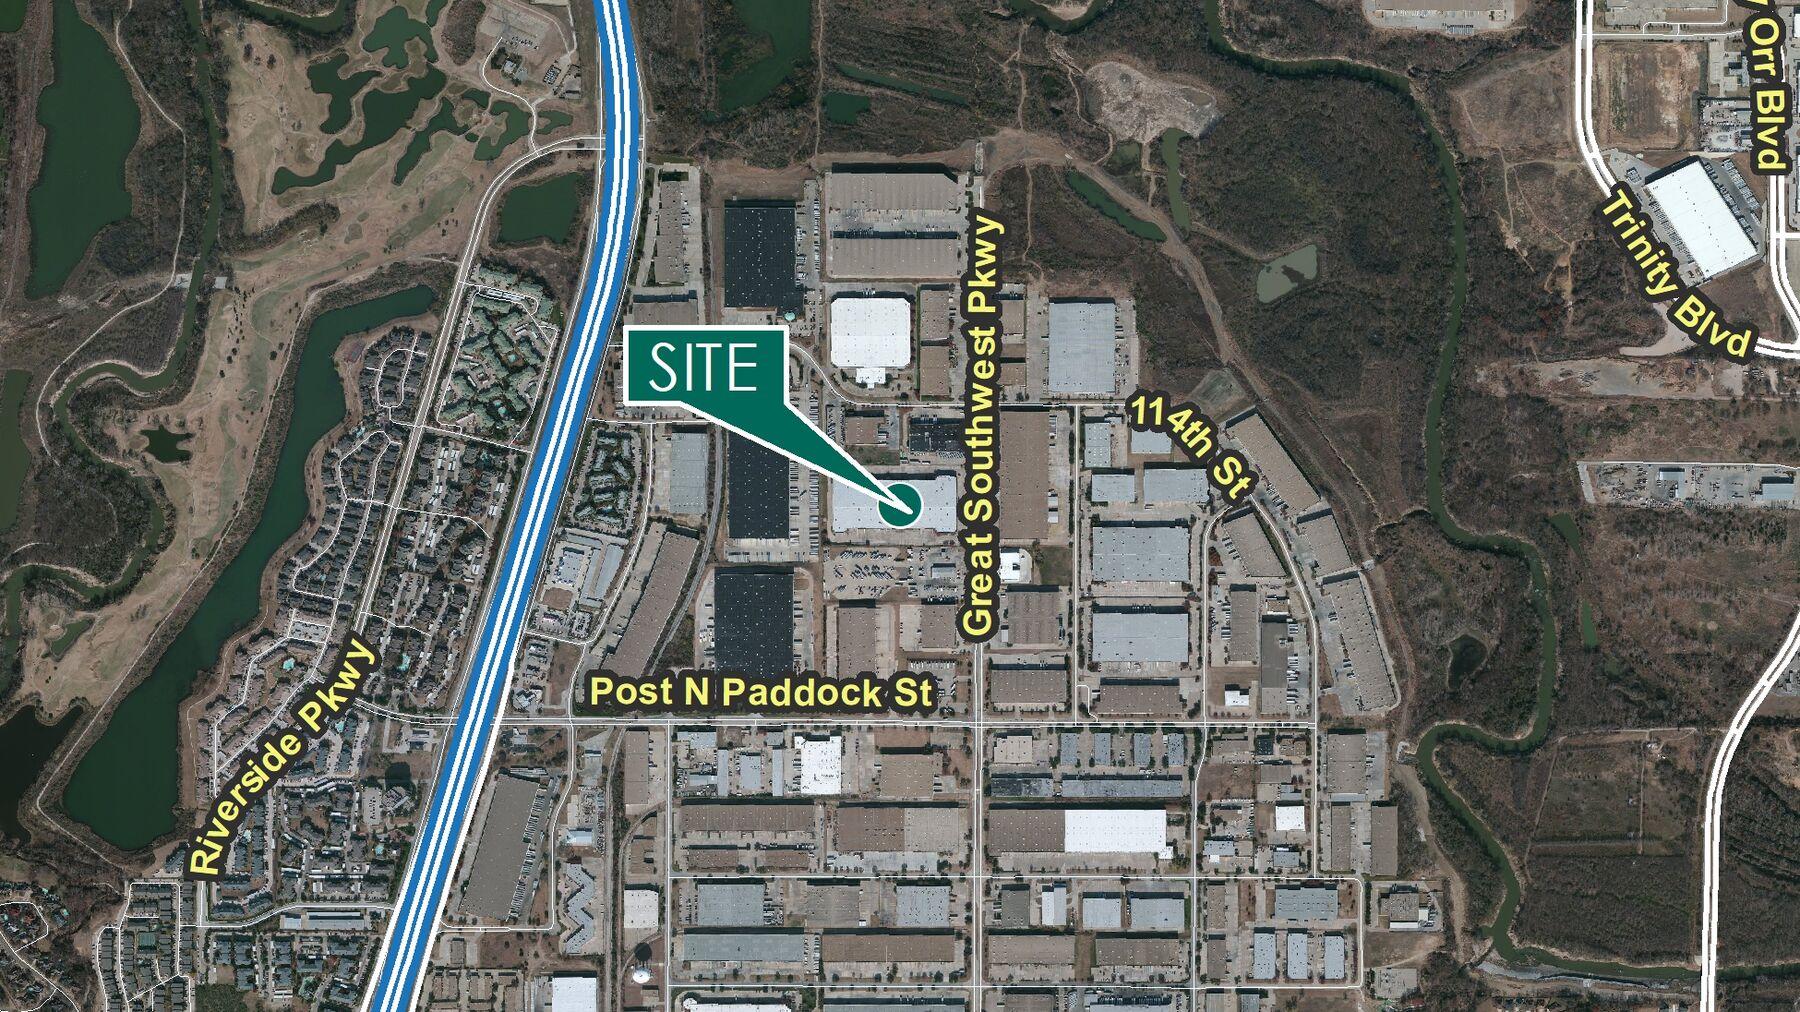 DPM-Prologis-Great-Southwest-60-DAL09502-2951-N-GSW-Parkway_AerialMap.jpg